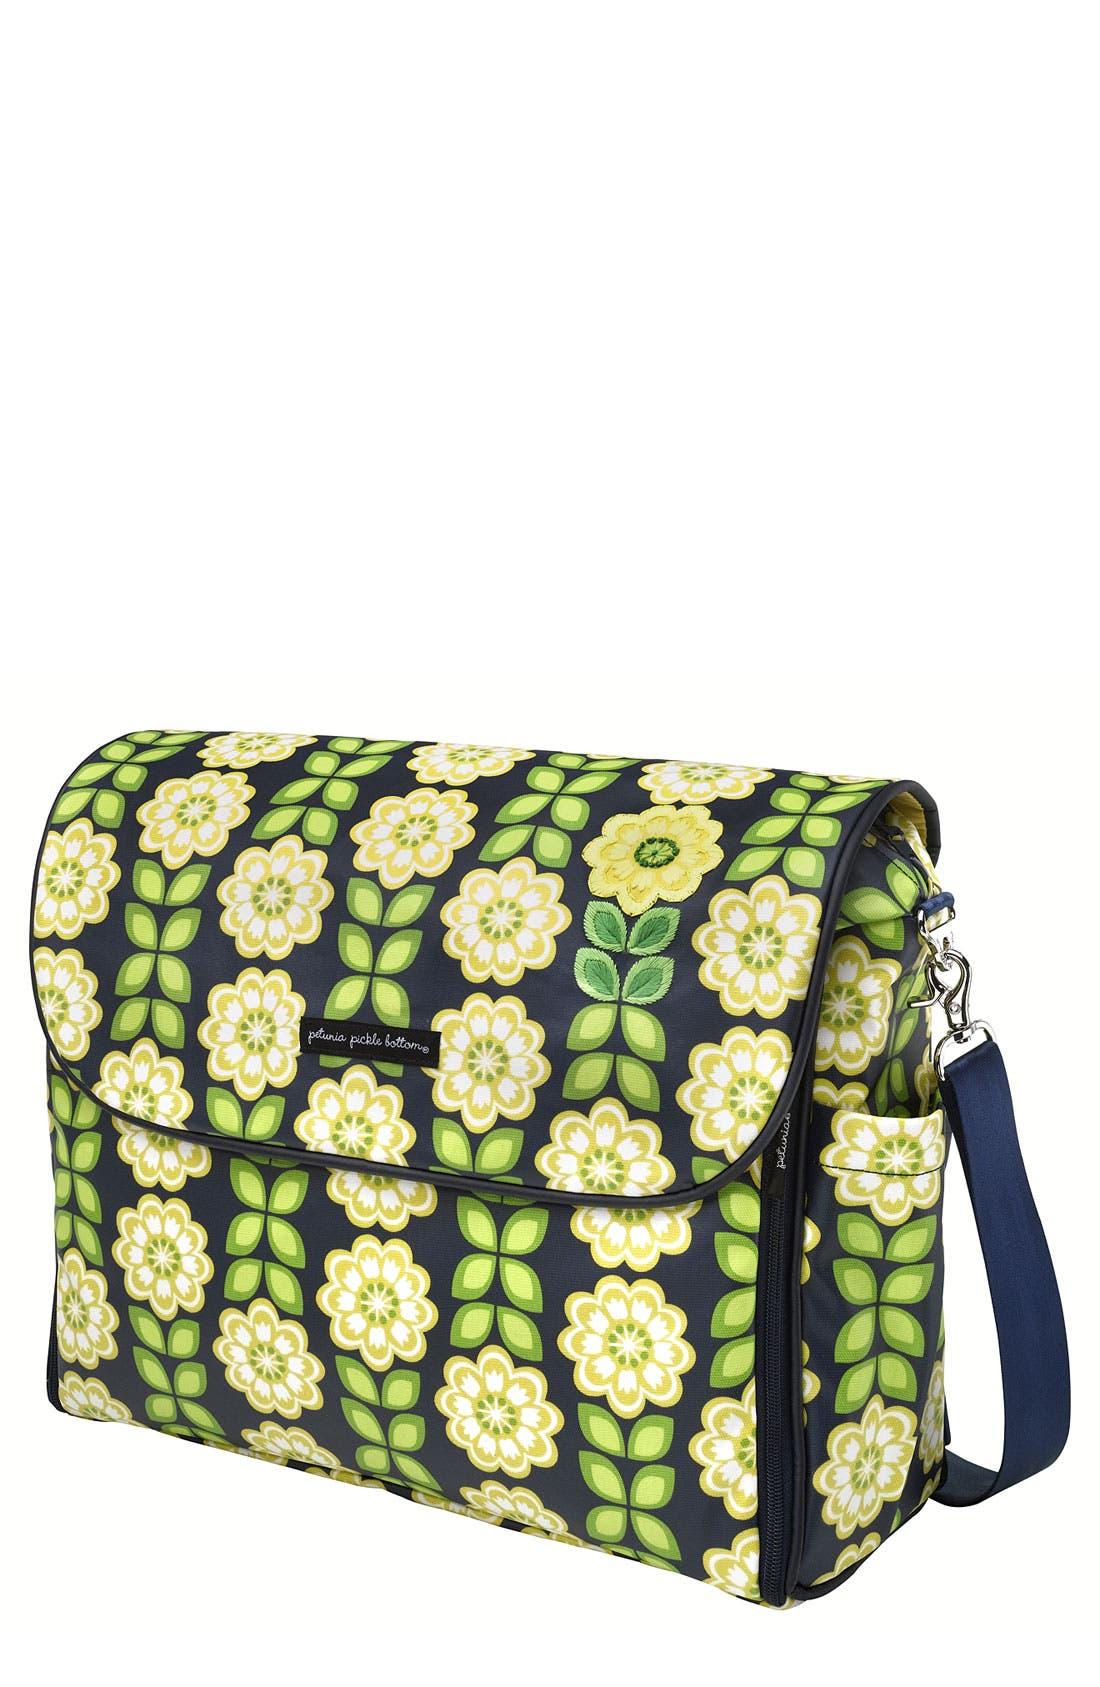 Alternate Image 1 Selected - Petunia Pickle Bottom Glazed 'Abundance Boxy Backpack' Diaper Bag